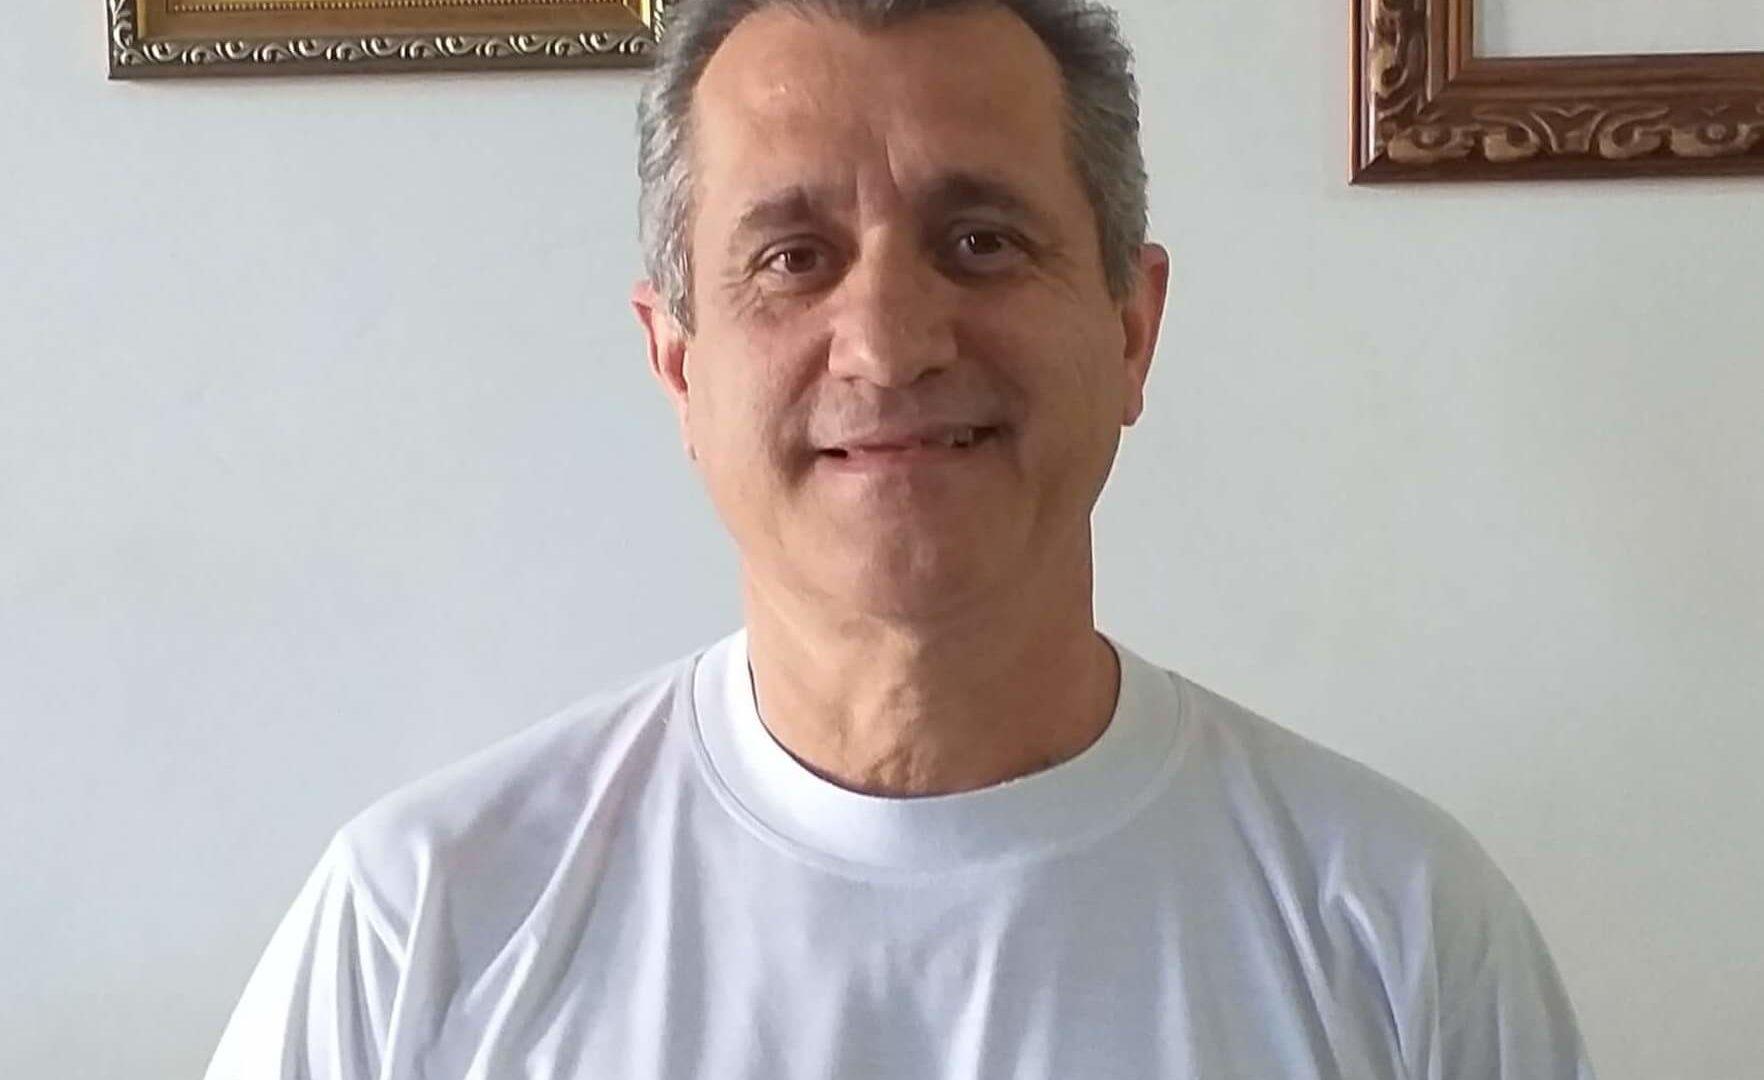 Danilo José Ulhoa